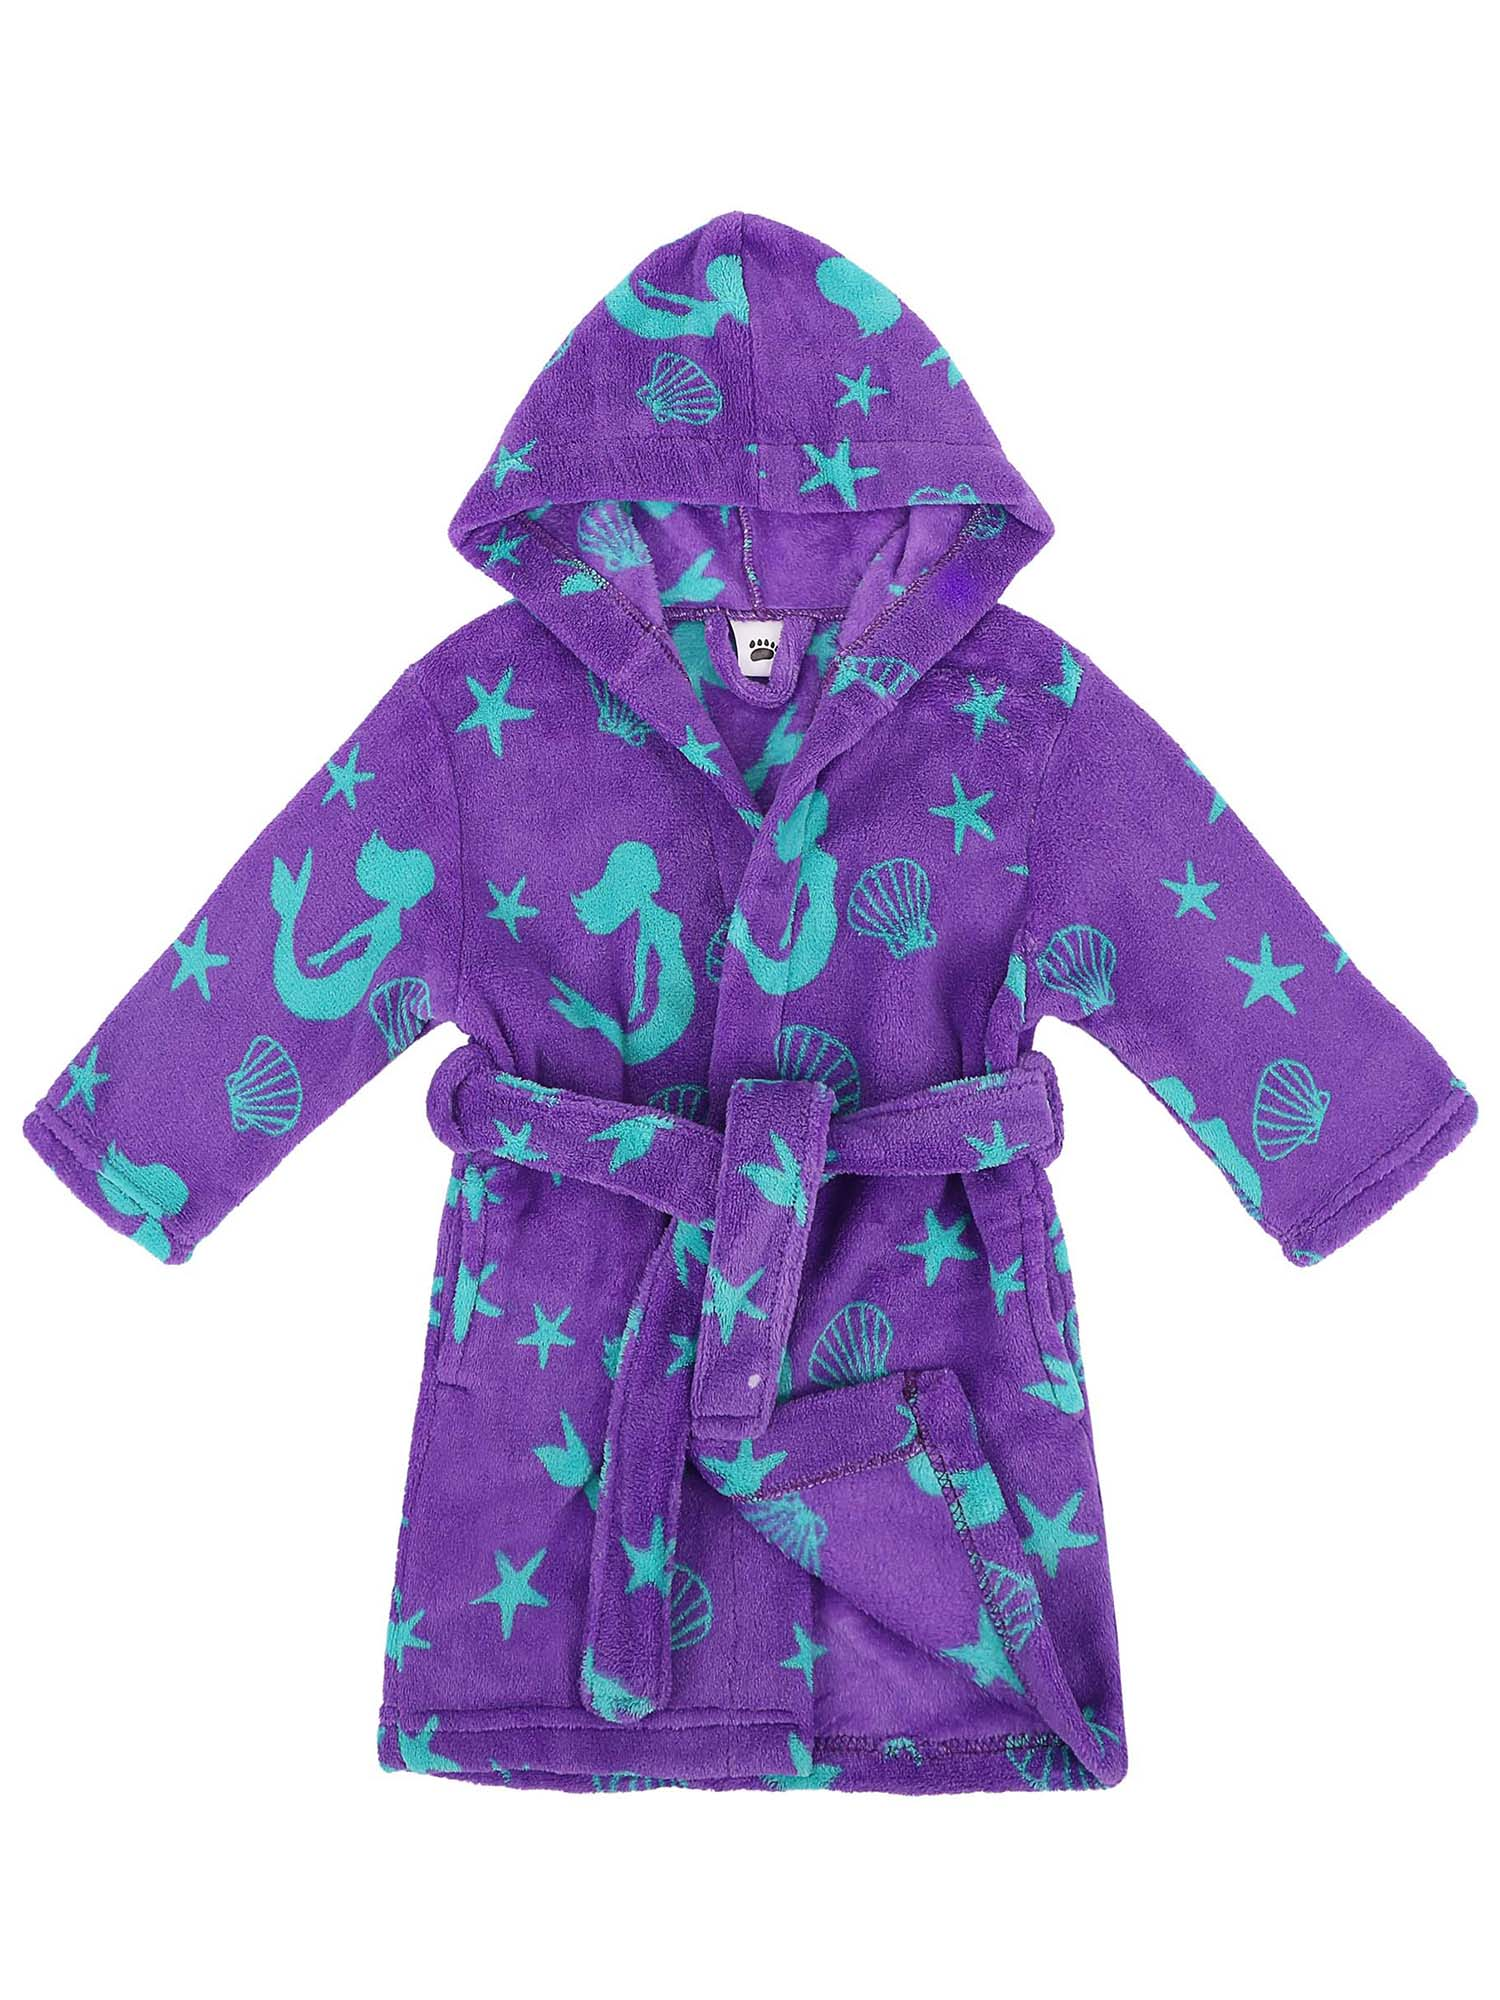 Girls Robe Hooded Printed Fleece Bathrobe w/Side Pockets,Unicorns,M